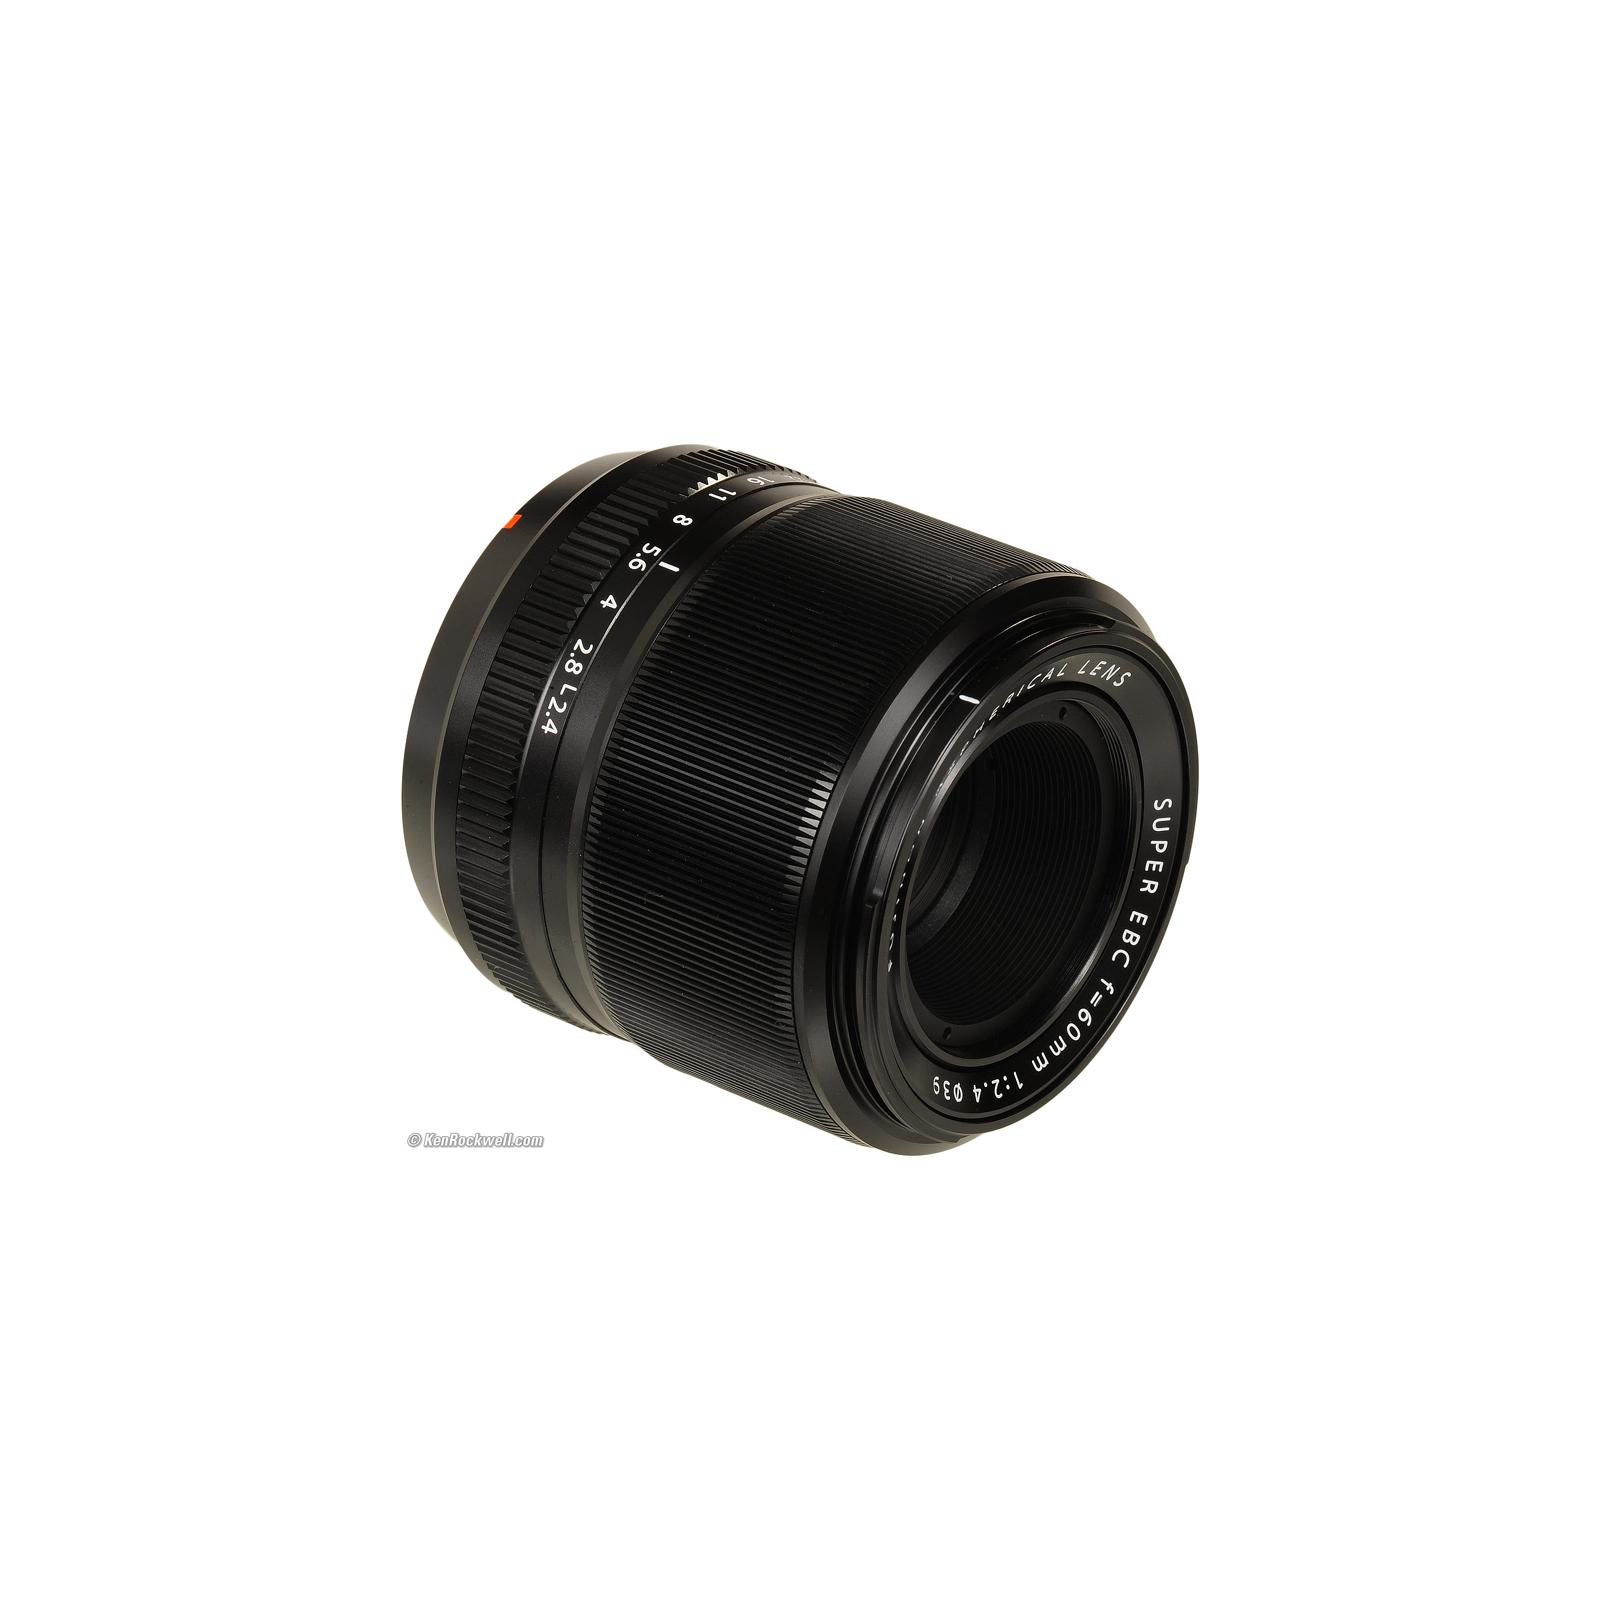 Объектив Fujifilm XF-60mm F2.4 R Macro (16240767) изображение 5